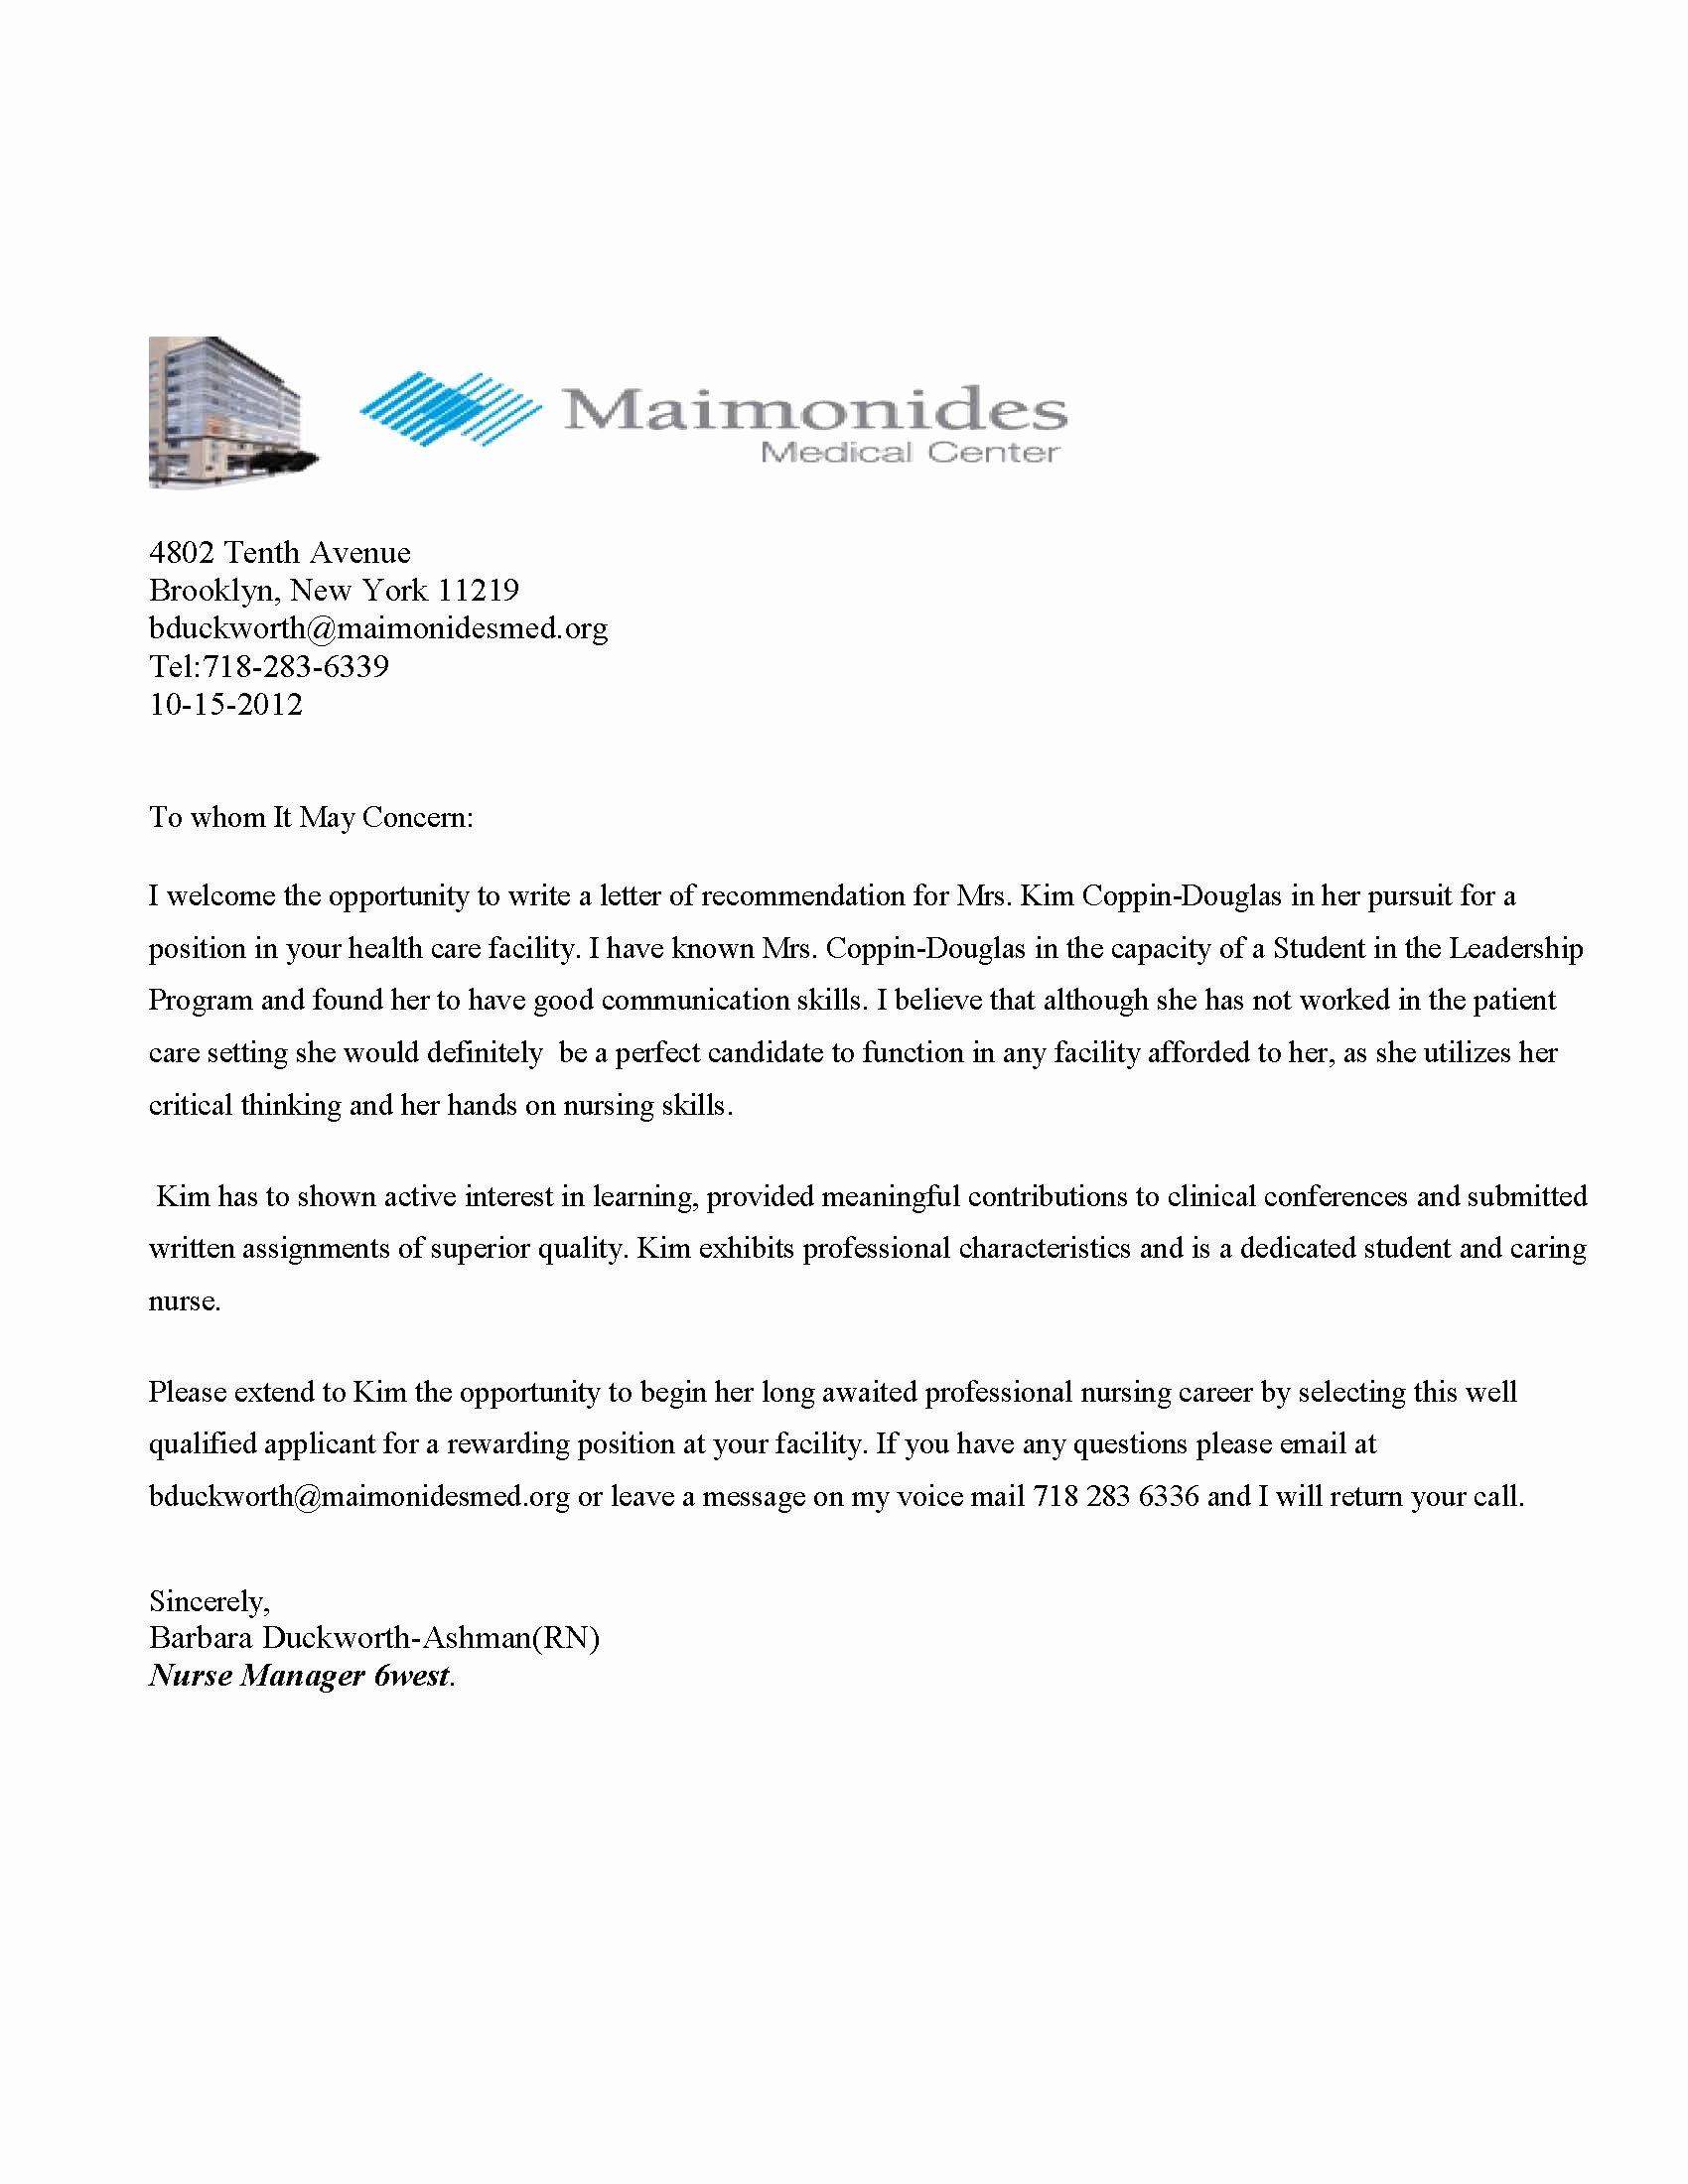 Dental School Recommendation Letter Awesome 13 Luxury Dental Letter Re Mendation